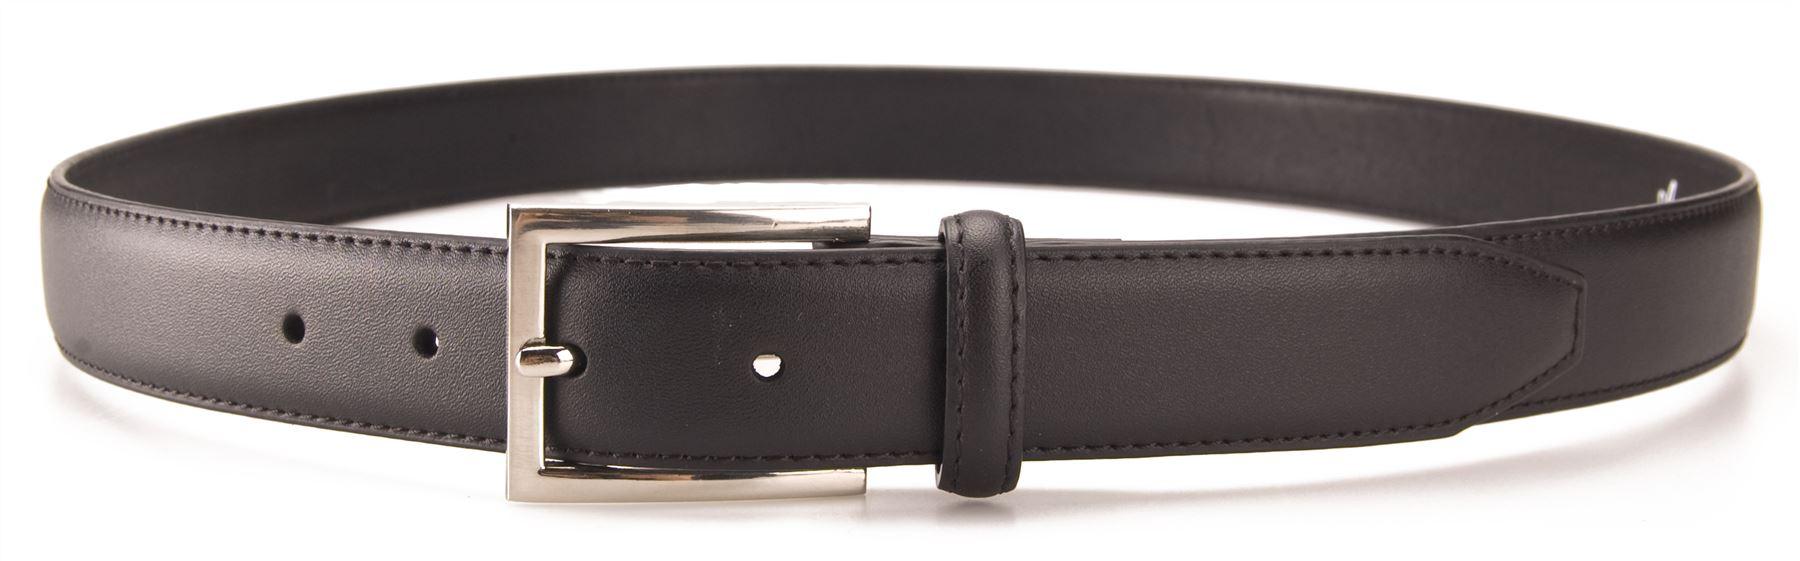 Mens-Real-Leather-Suit-Trouser-Belt-Silver-Buckle-Genuine-Ashford-Ridge-5401